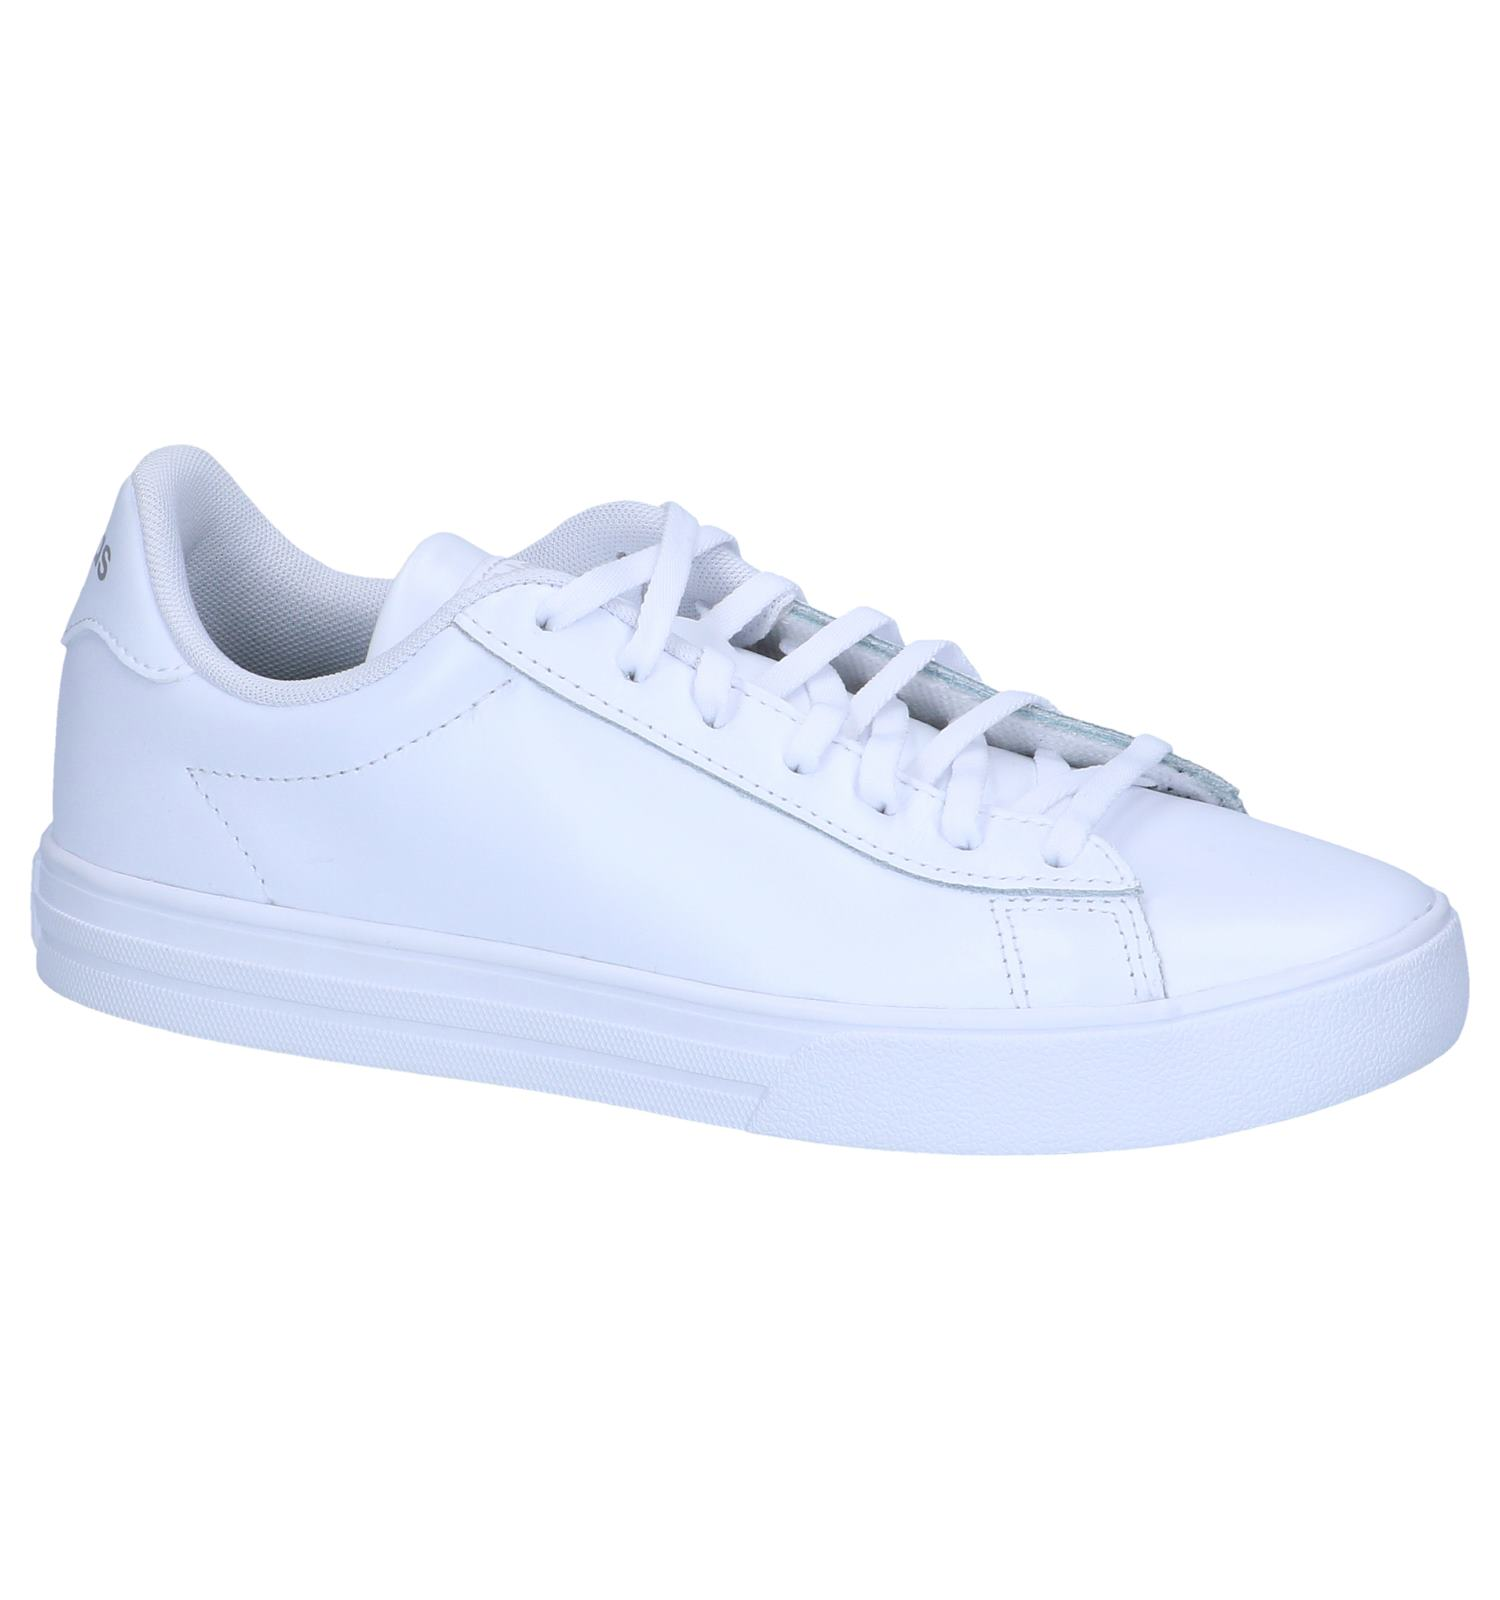 b5802b9885d Witte Sneakers adidas Daily 2.0 | TORFS.BE | Gratis verzend en retour